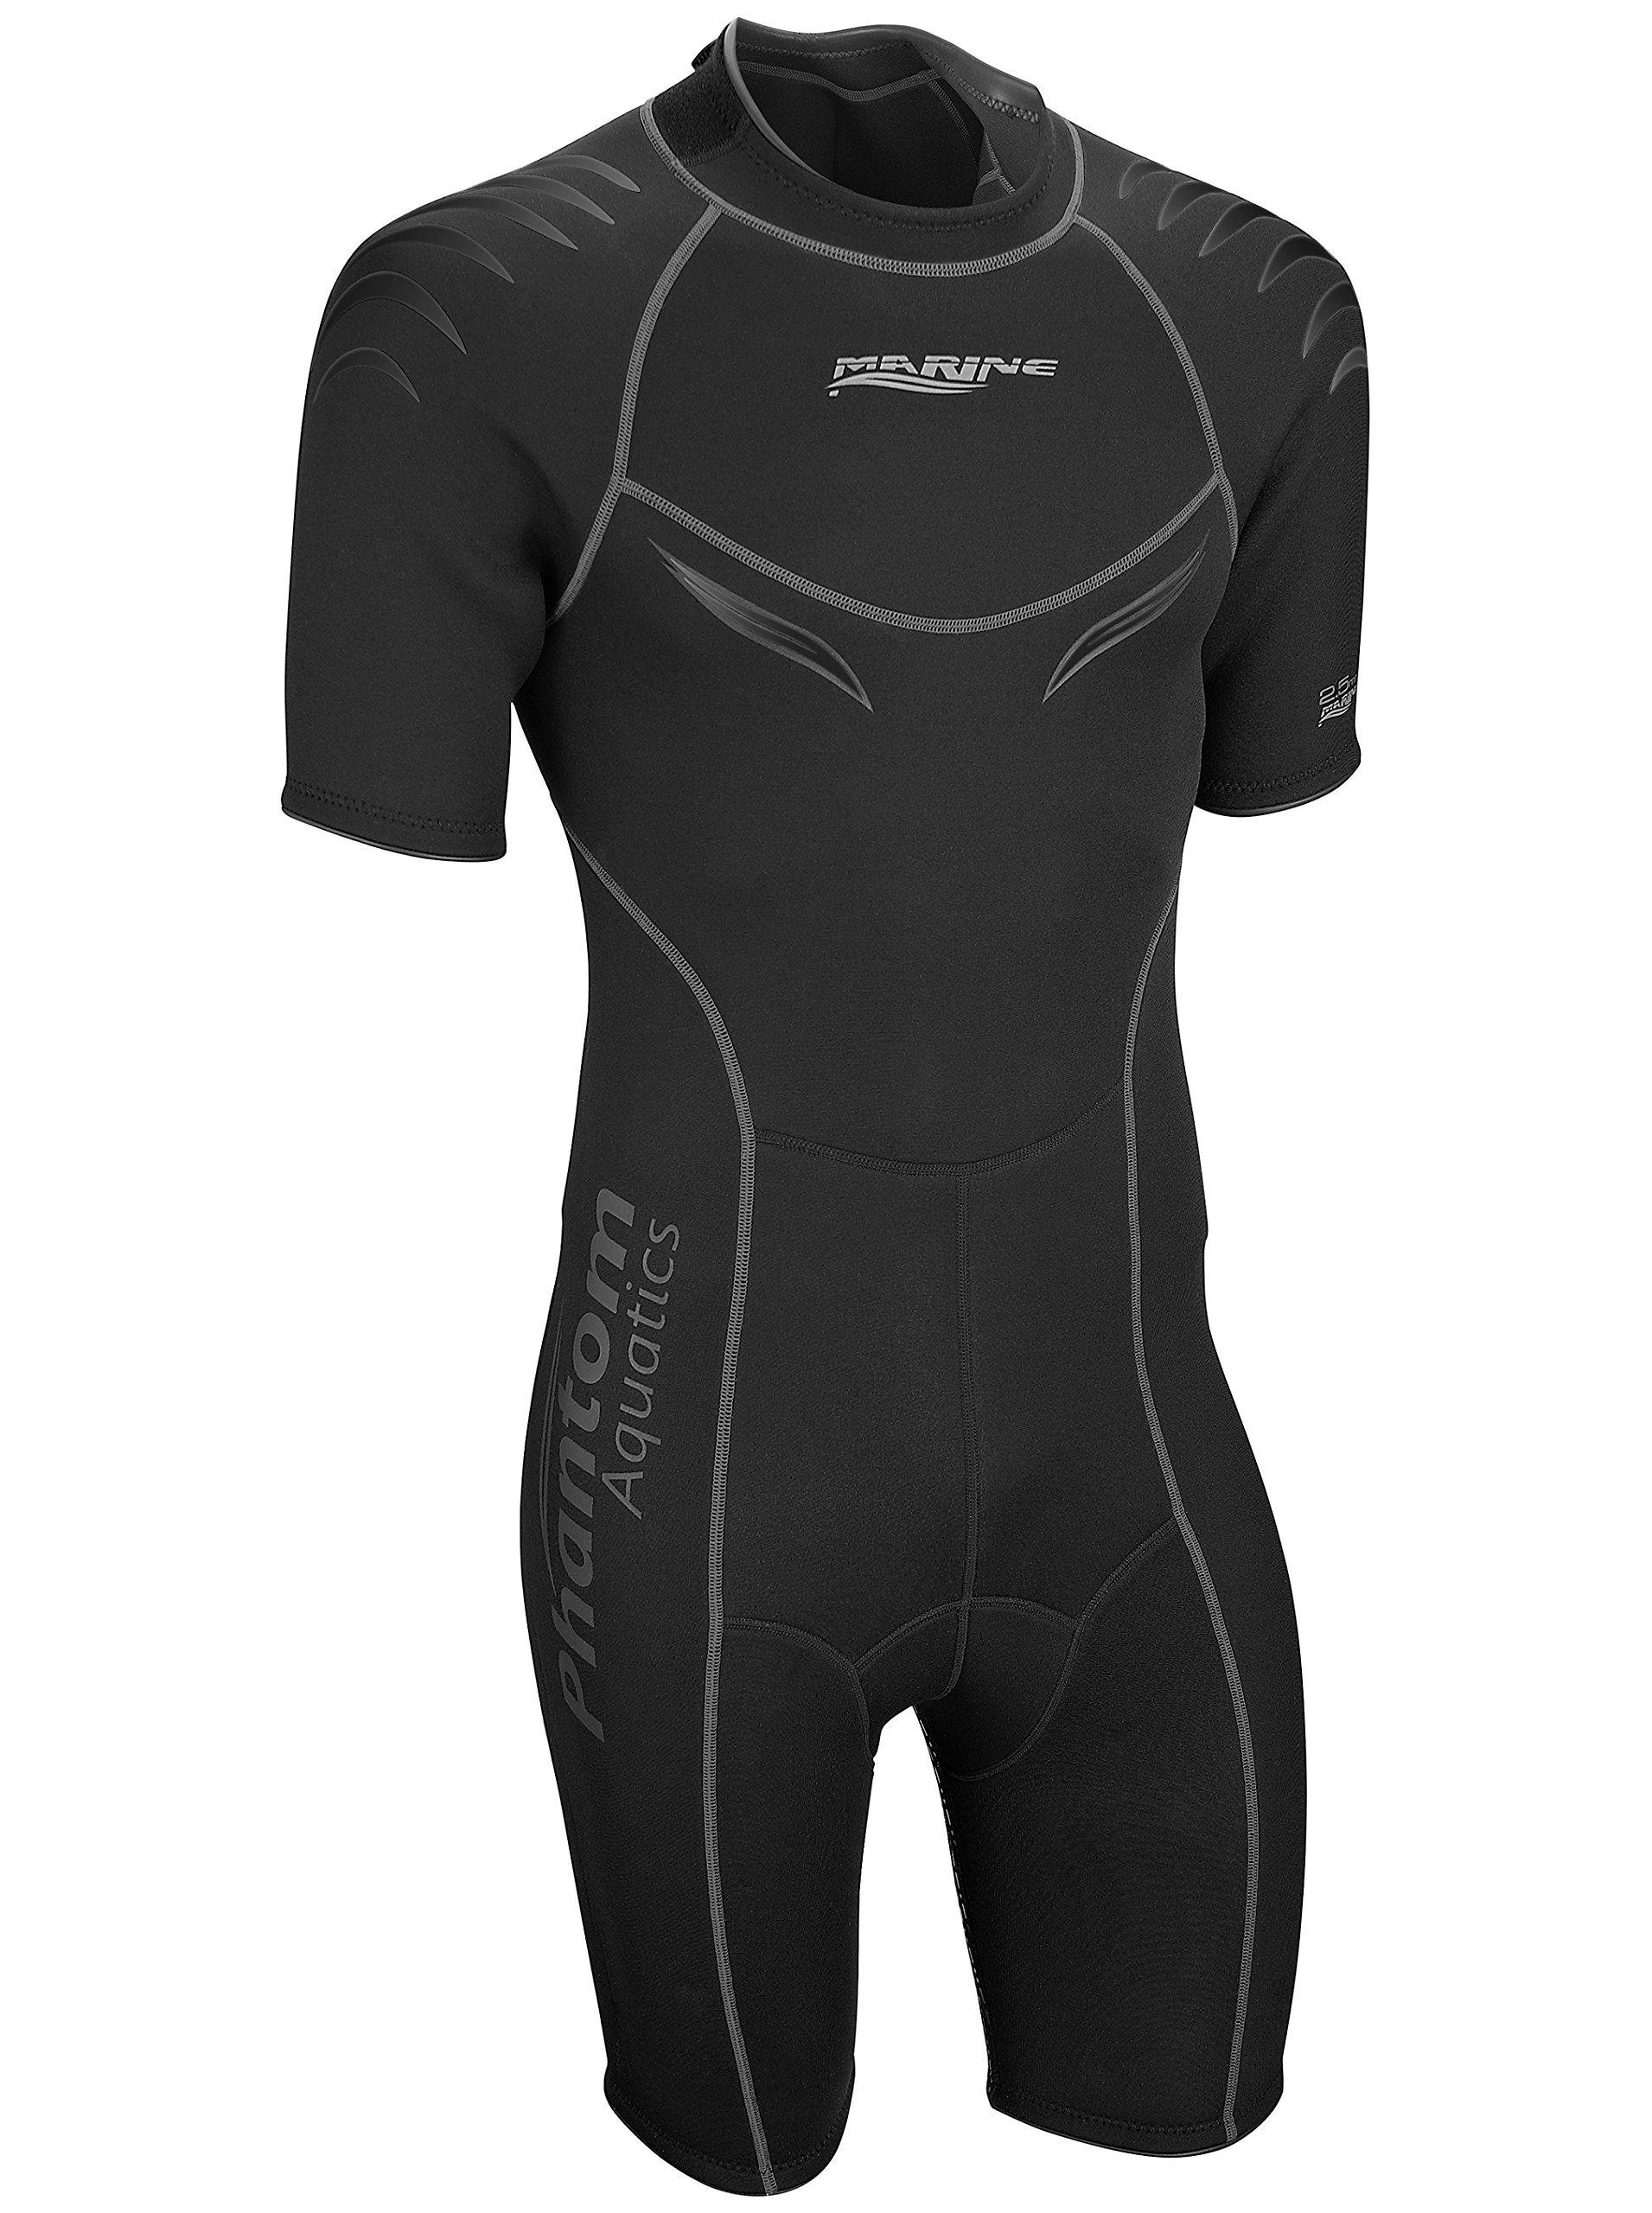 Phantom Aquatics Marine Men's Shorty Wetsuit, All Black - XX-Large by Phantom Aquatics